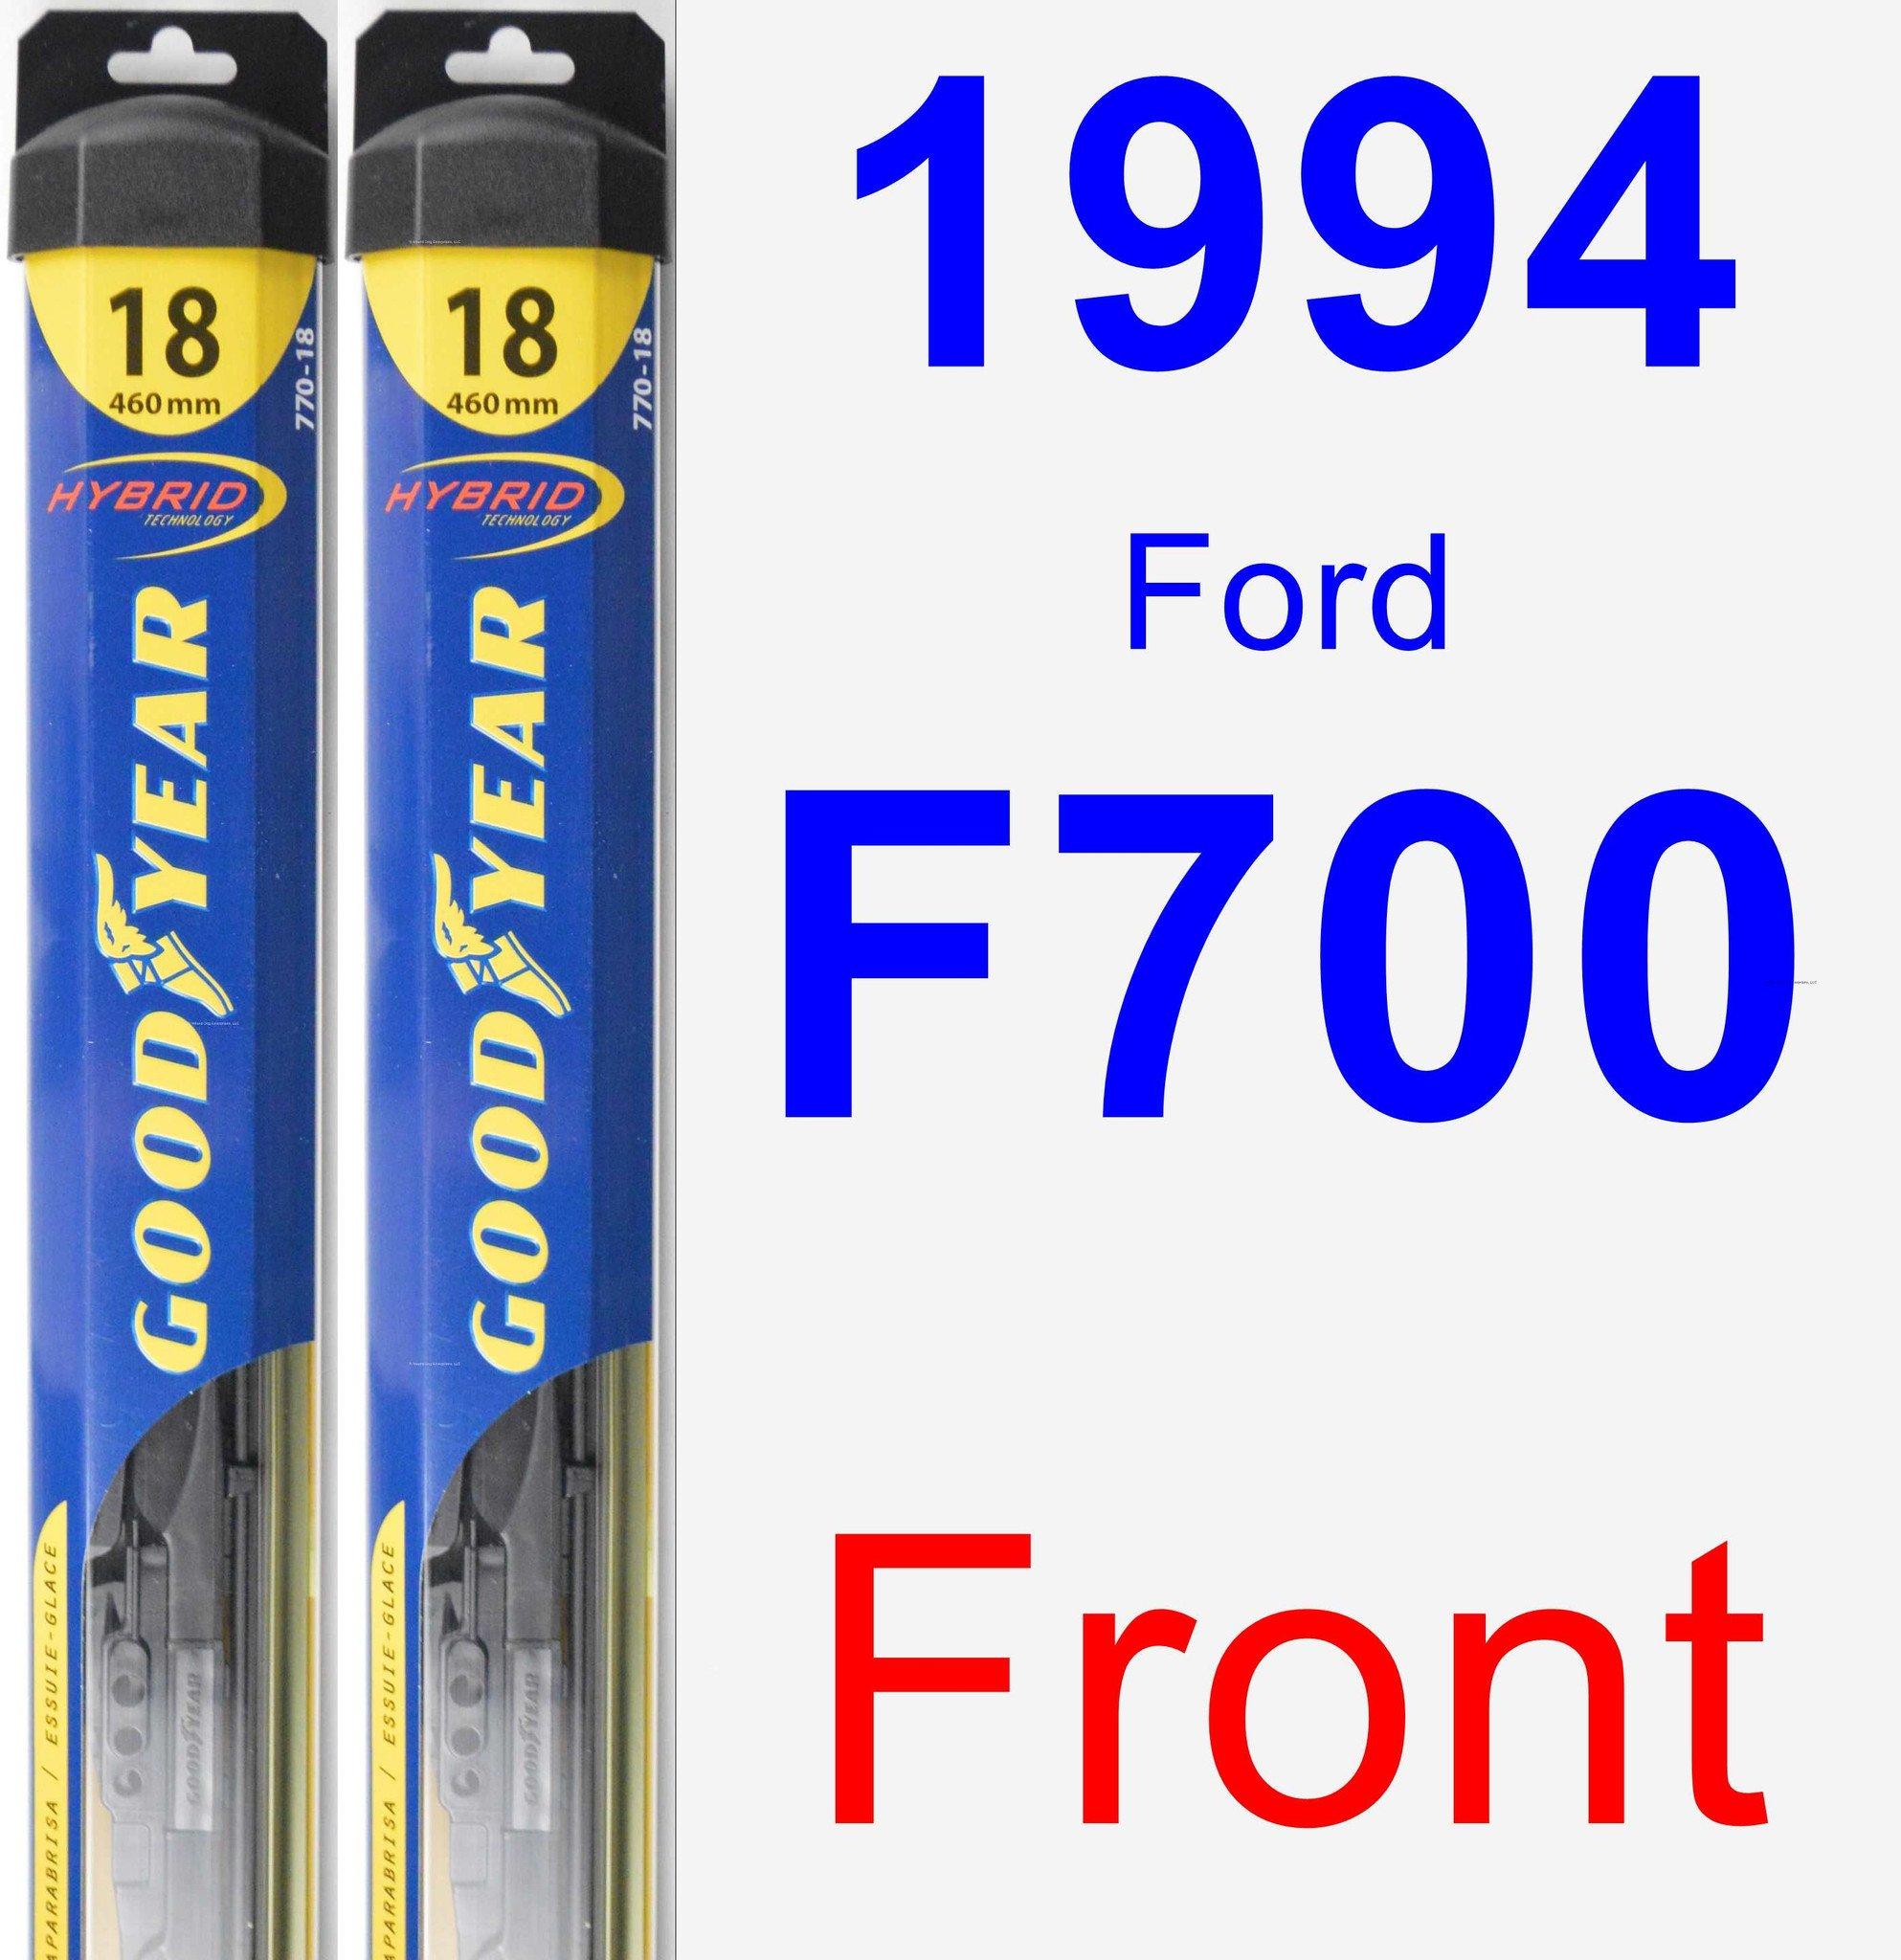 1994 Ford F700 Wiper Blade Set/Kit (Front) (2 Blades) - Hybrid